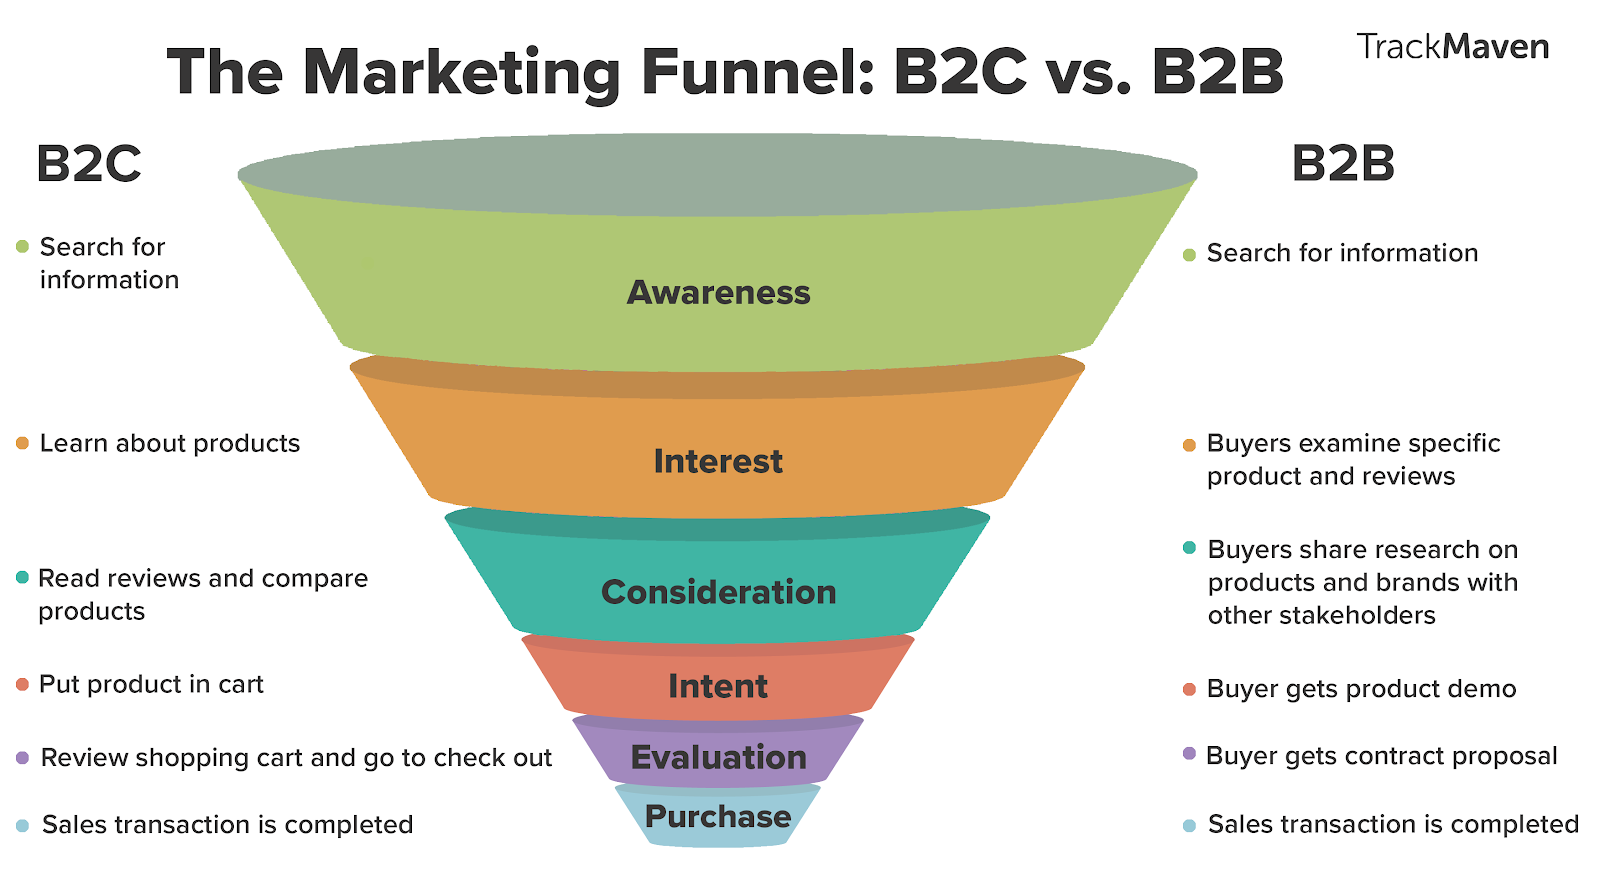 Marketing funnel for B2B versus B2C.